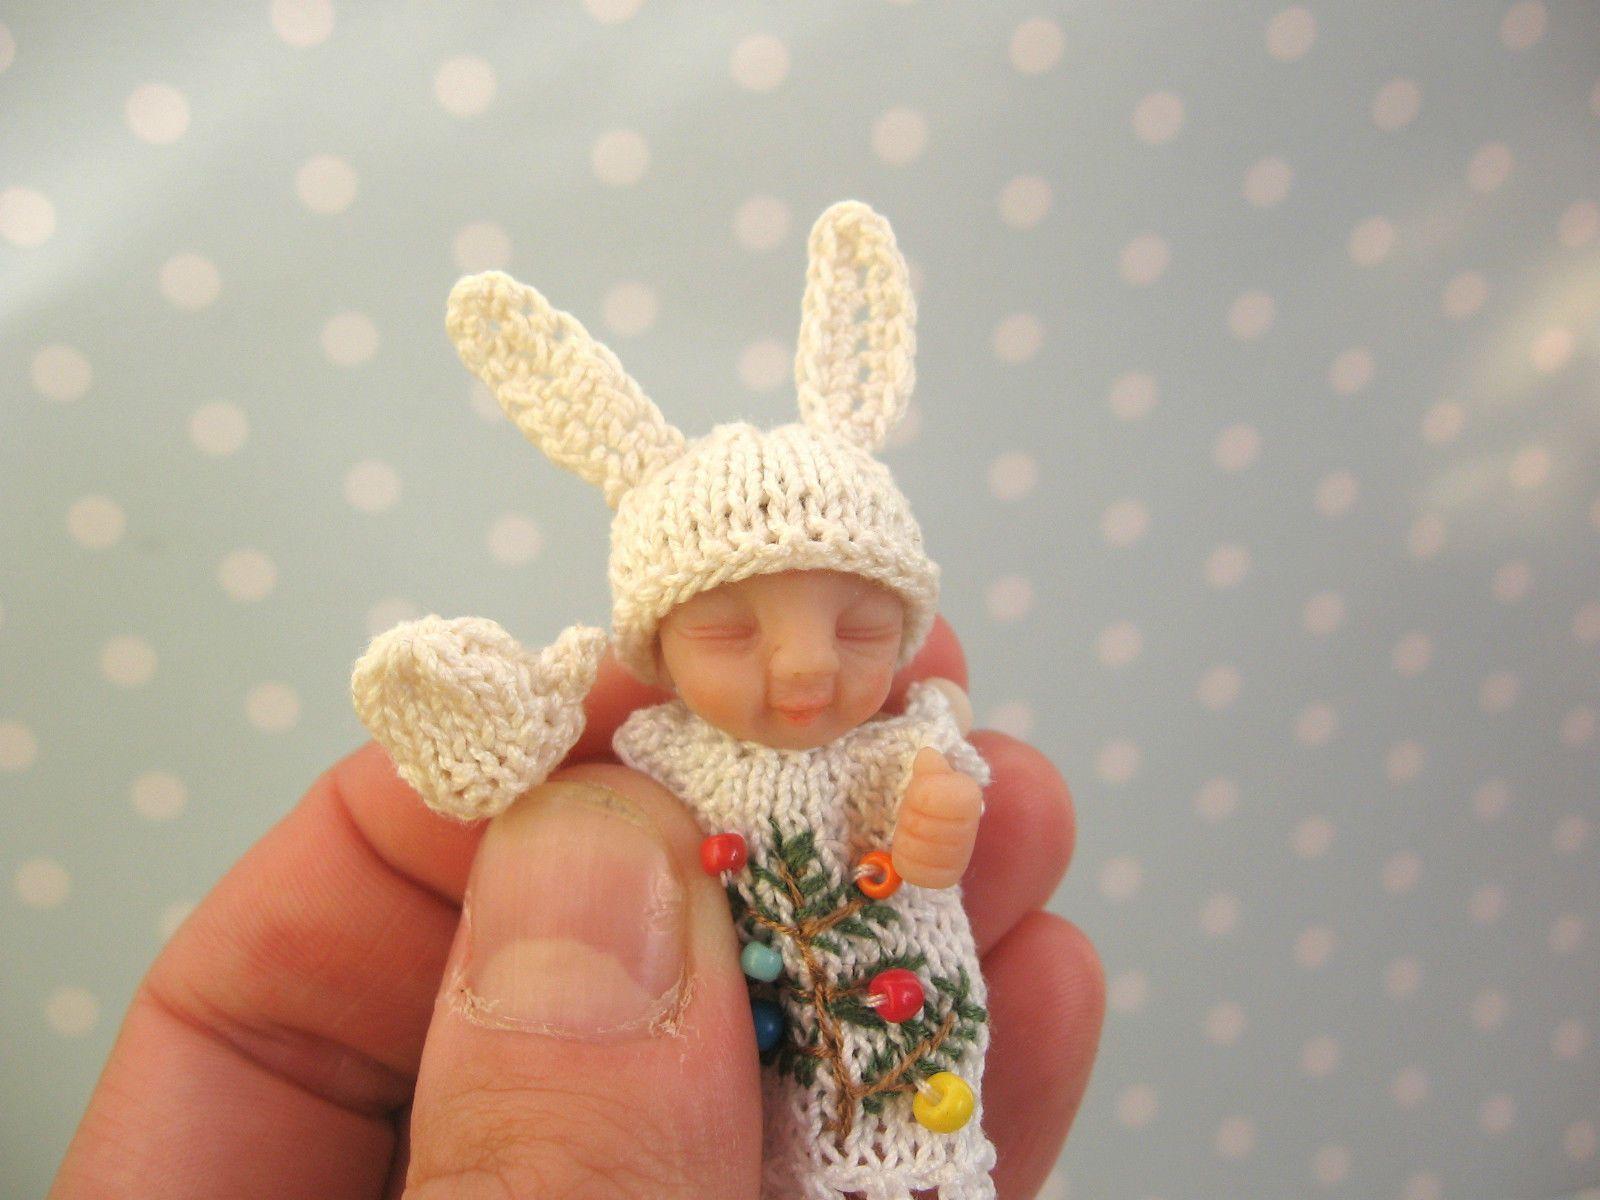 cf14932a9 1 12 Miniatur HANDSCHUHE Mütze Schal Handgestrickt für OOAK Baby ...